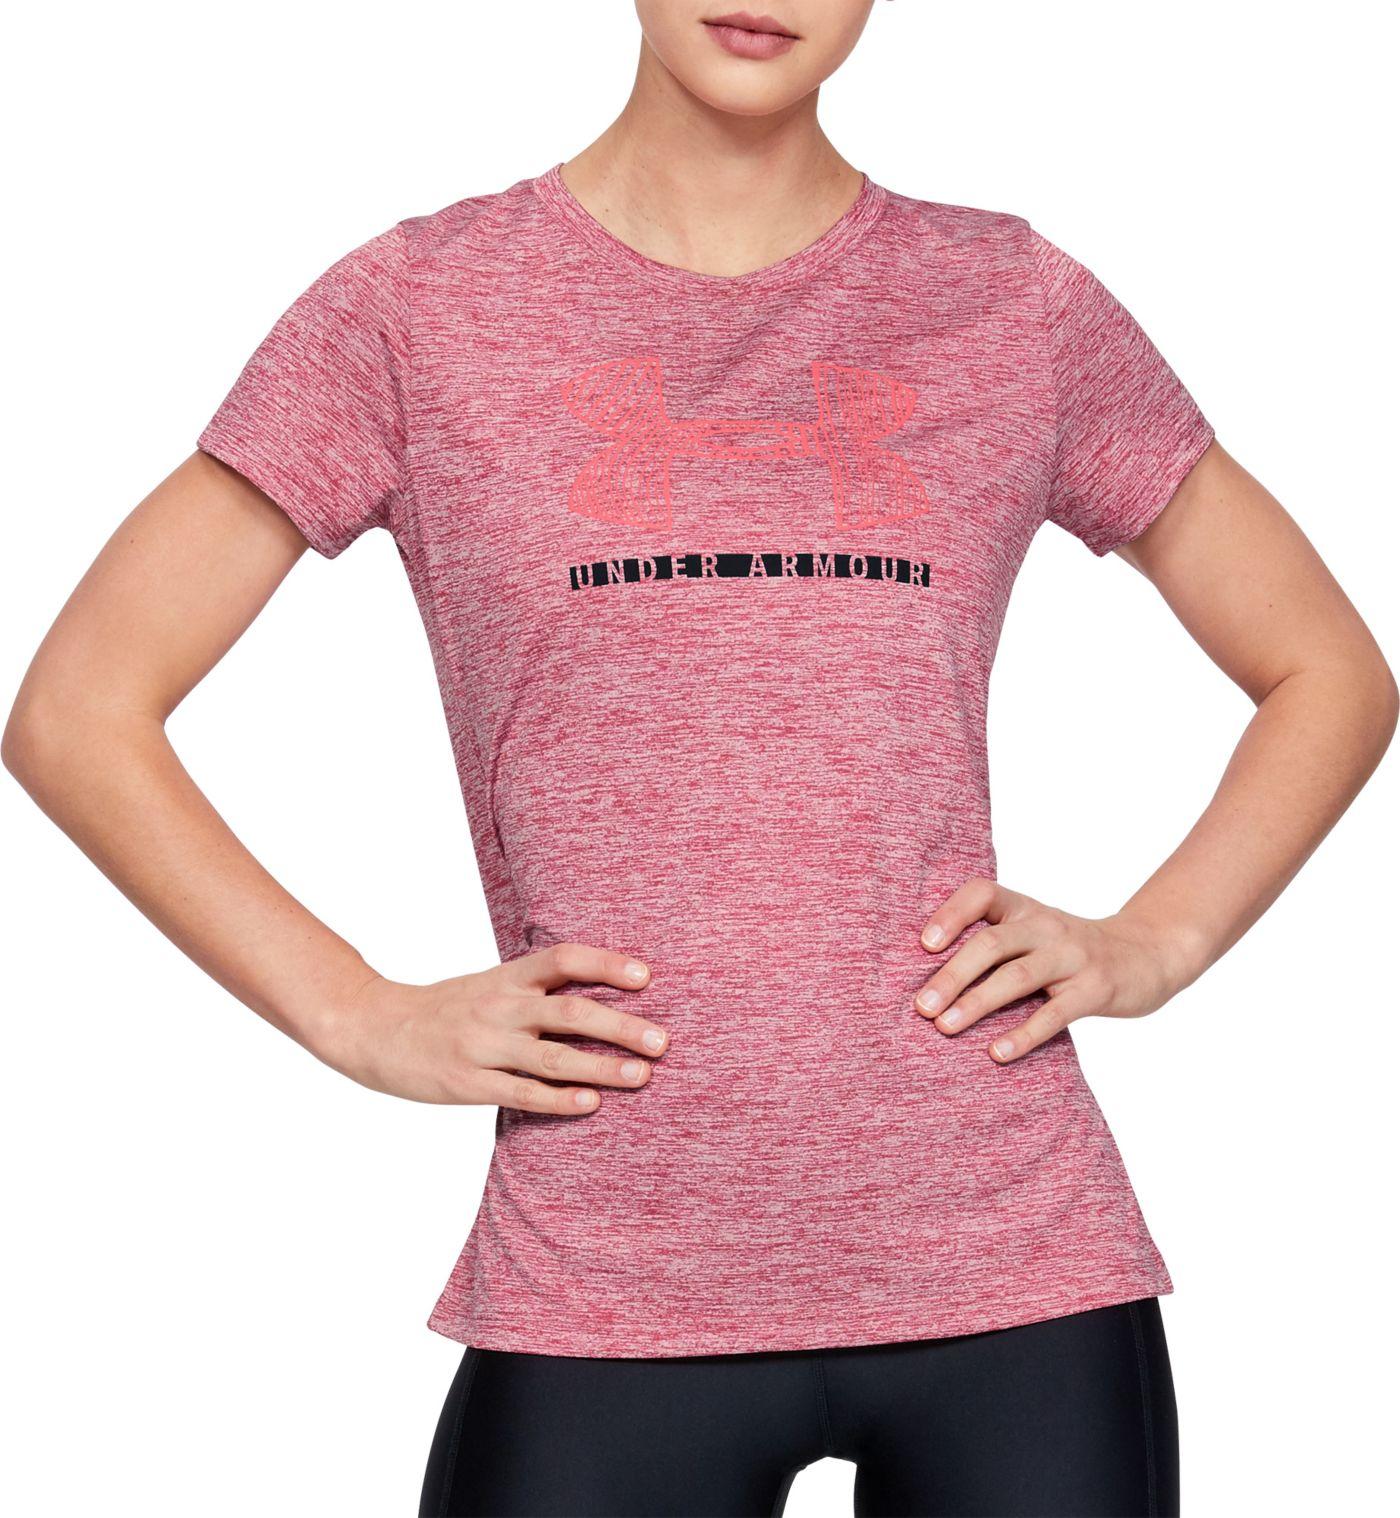 Under Armour Women's Tech Sportstyle Logo Graphic T-Shirt